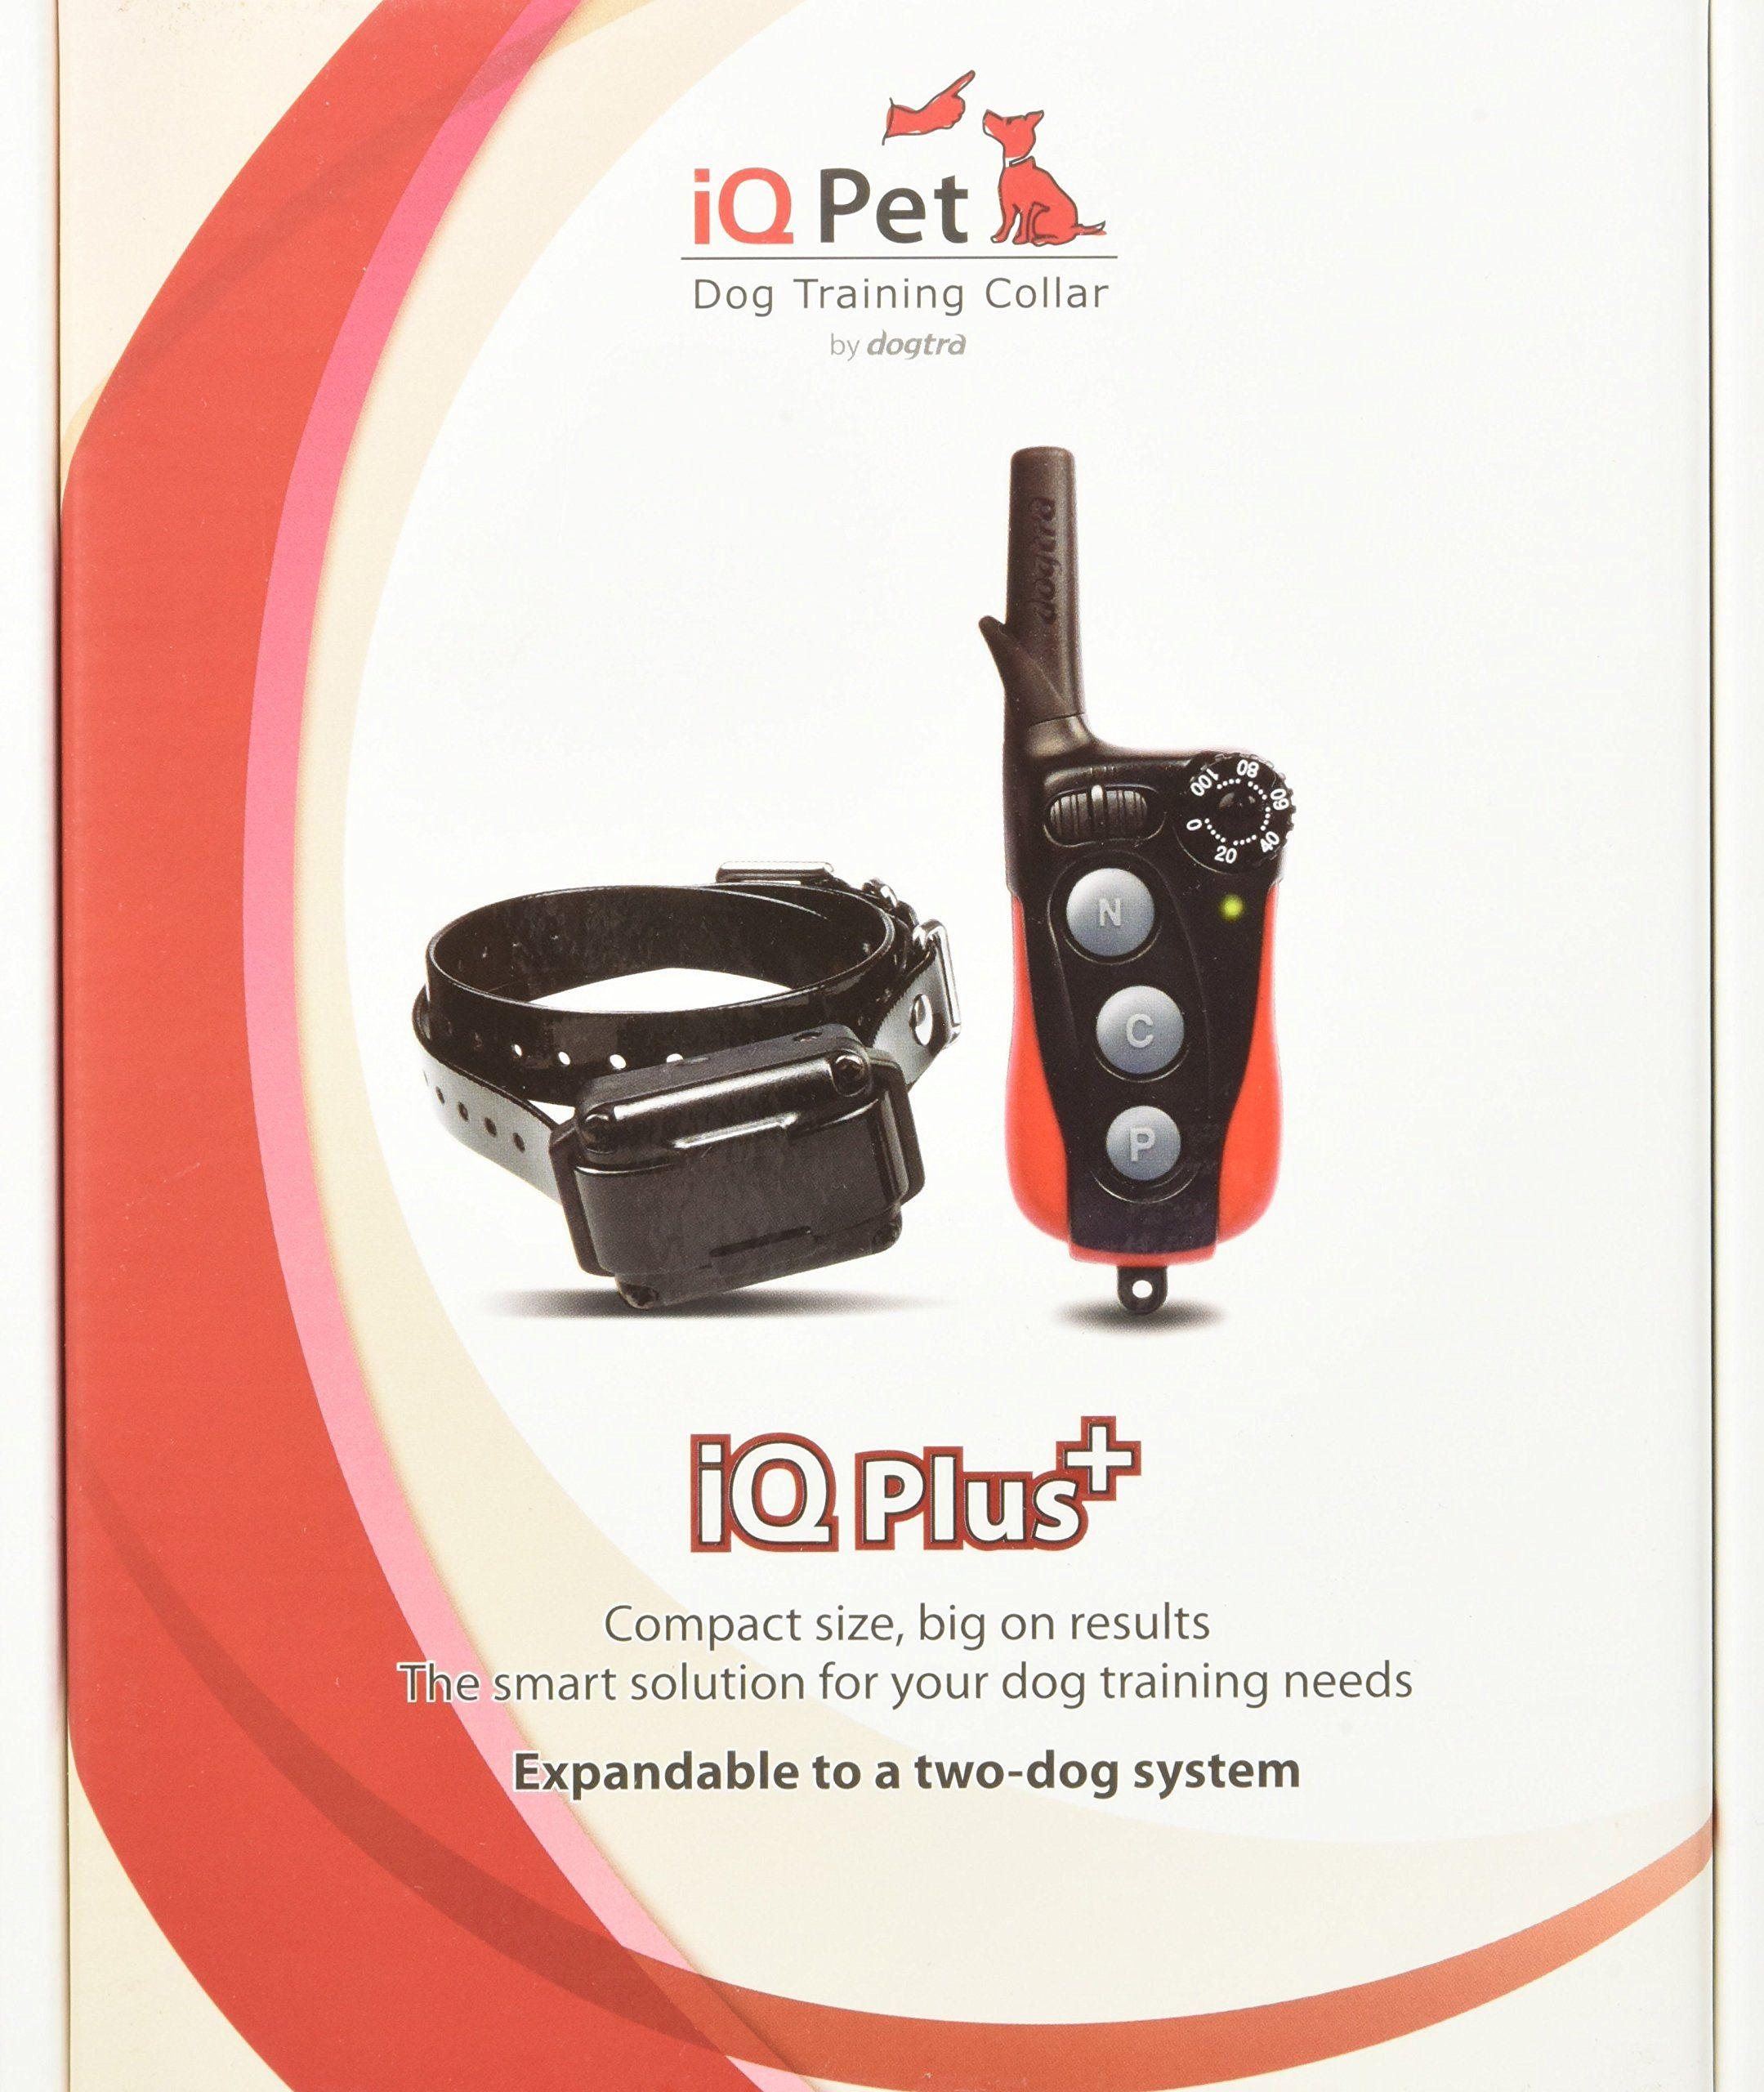 Dogtra iQ Remote Dog Training Collar